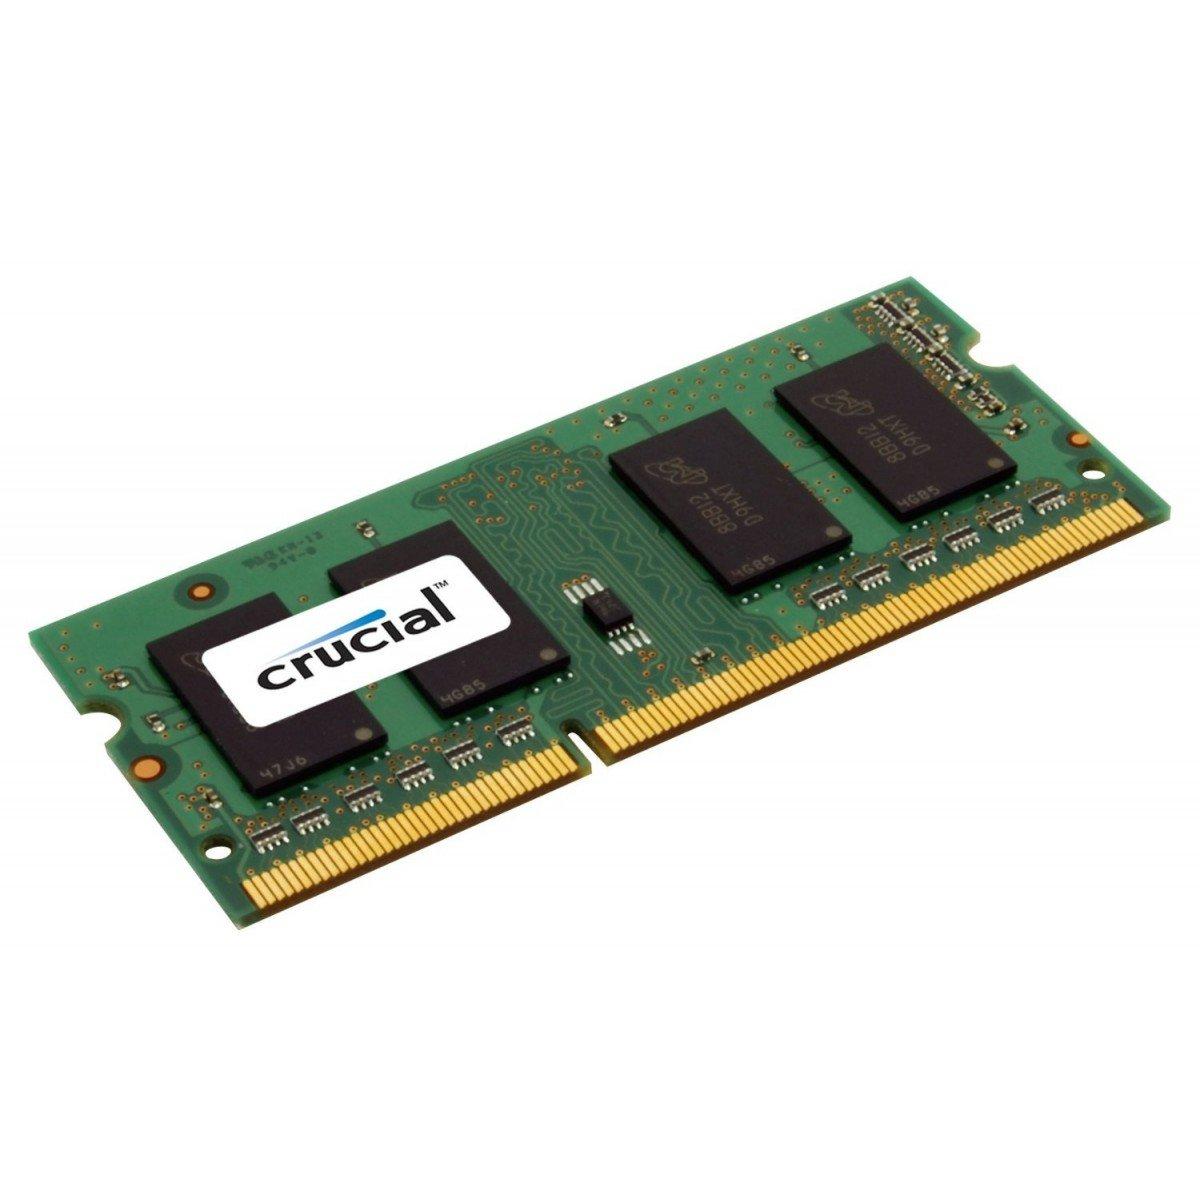 crucial 英睿达 DDR3 1600 8G 笔记本内存,$21.99+$2.11(直邮到手价格约¥157)